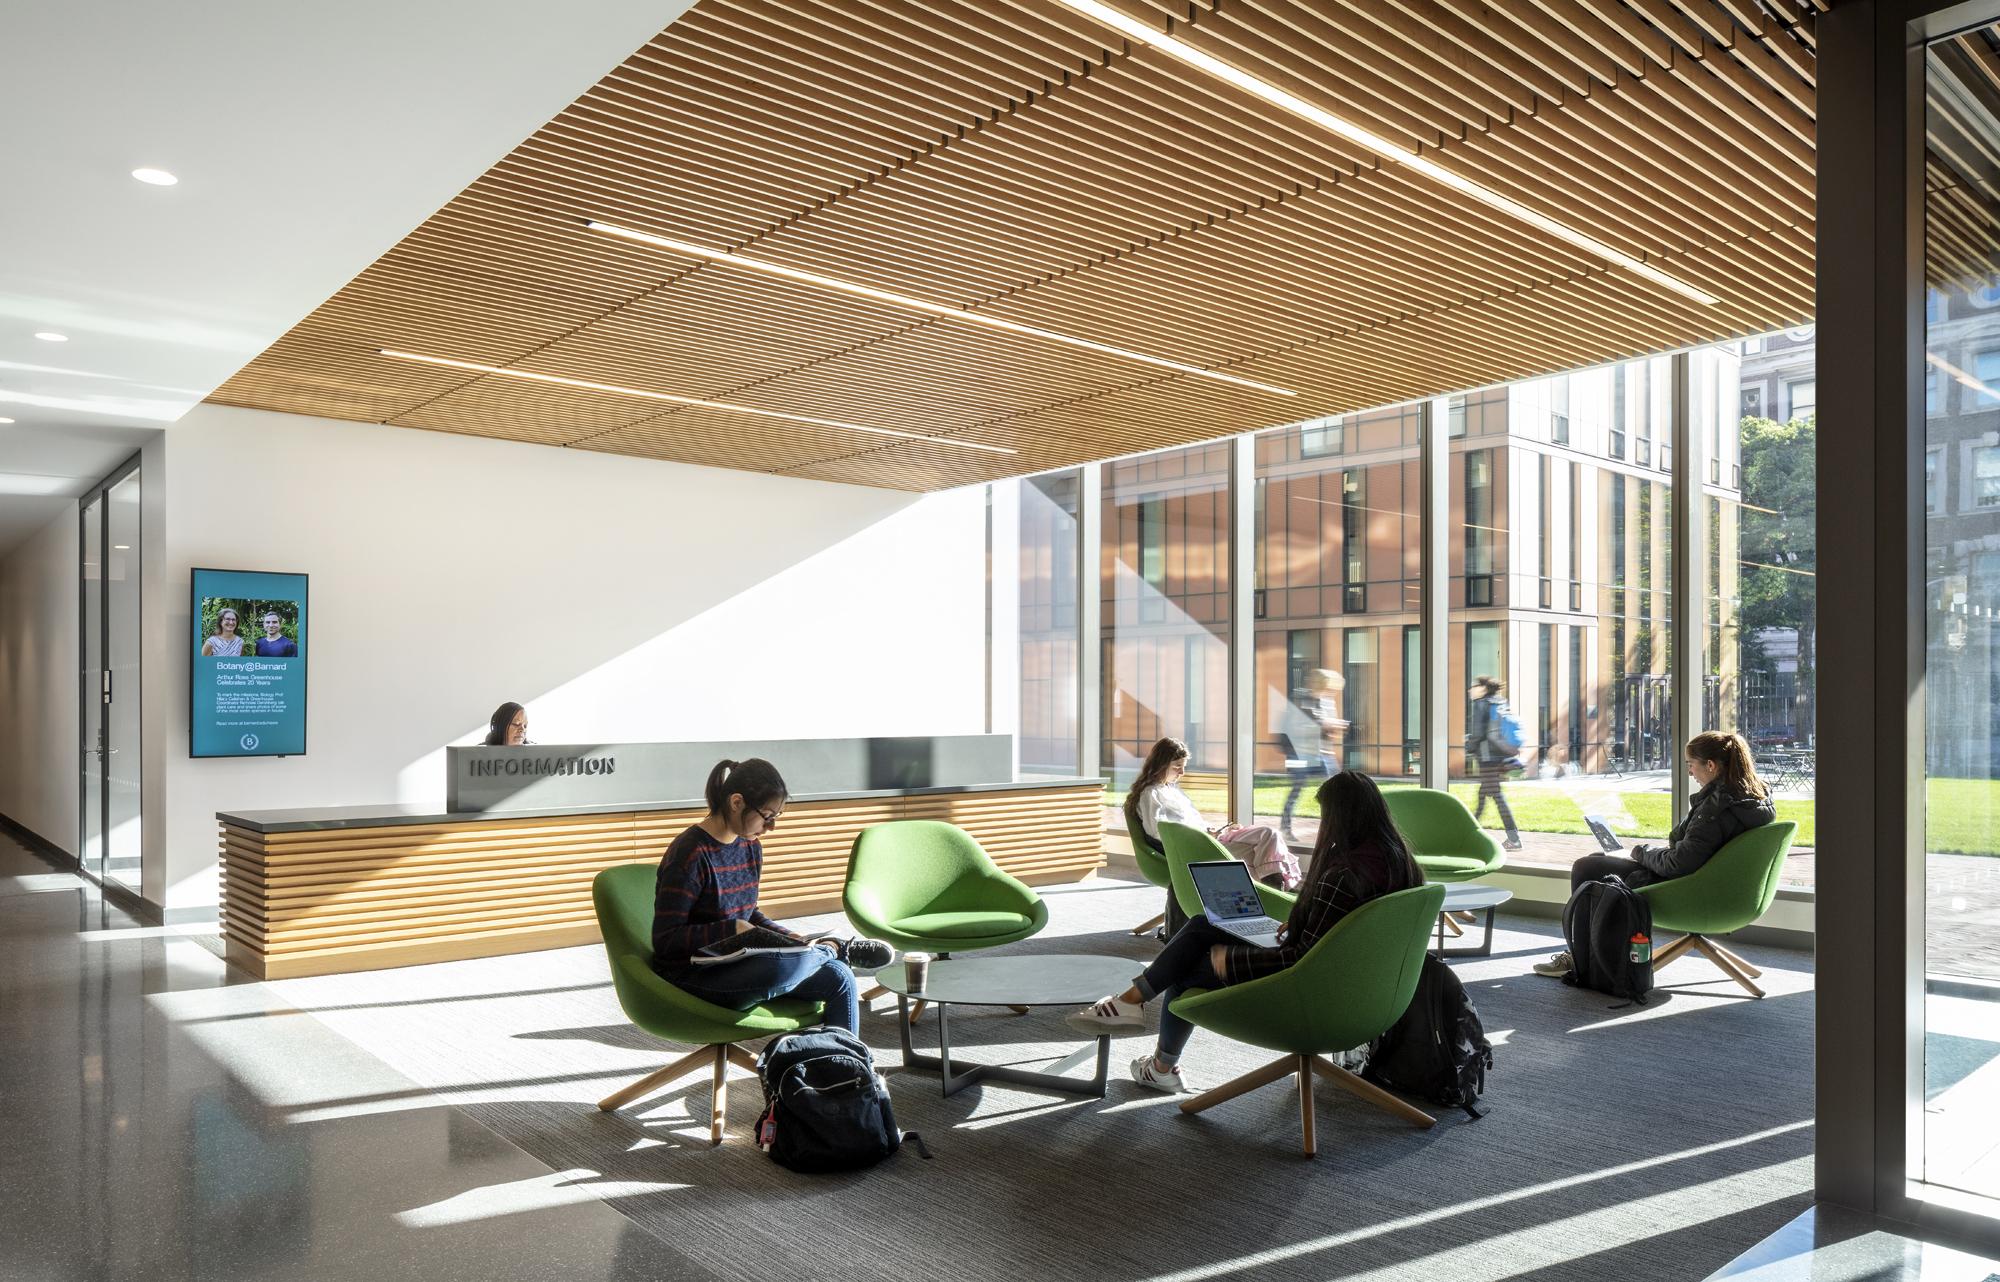 Barnard College, New York, NY   Skidmore, Owings & Merrill